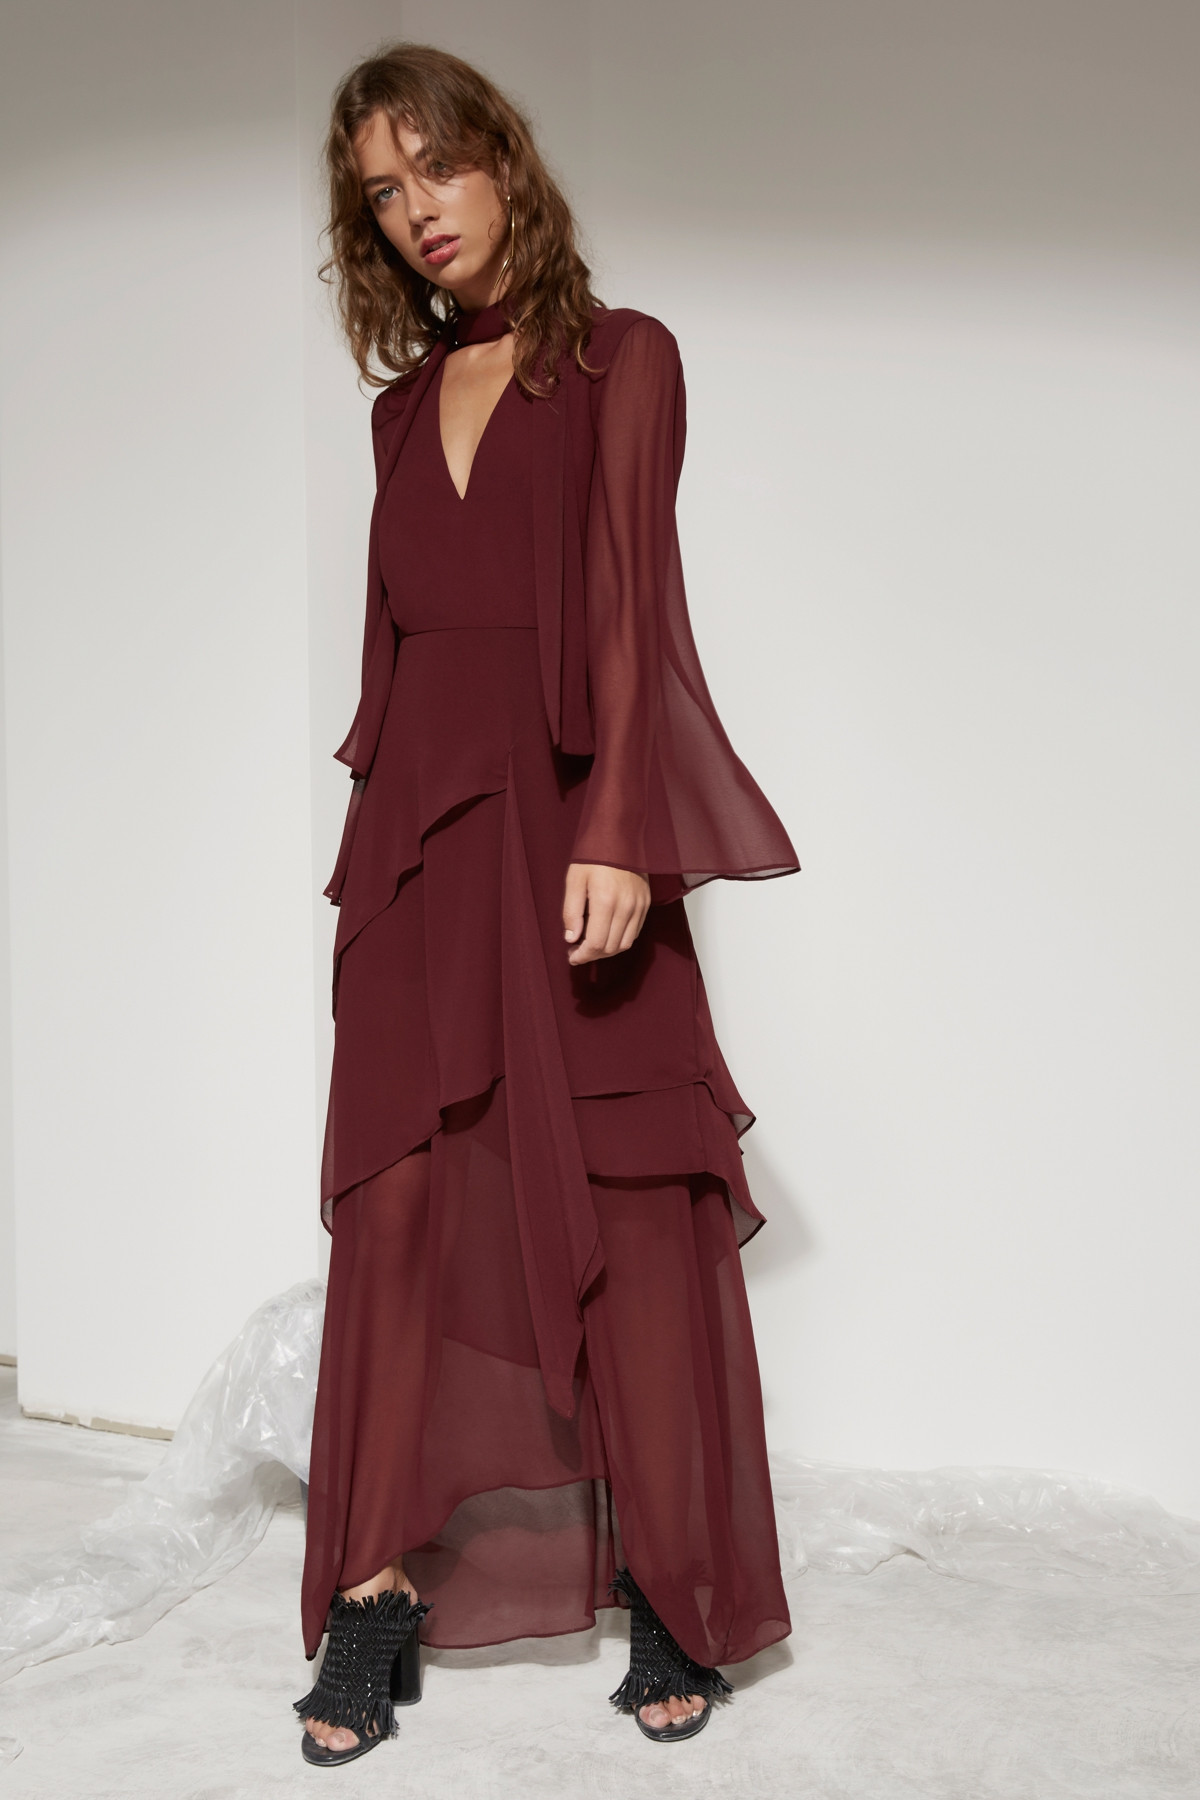 Burgundy Autonomy Dress.jpg